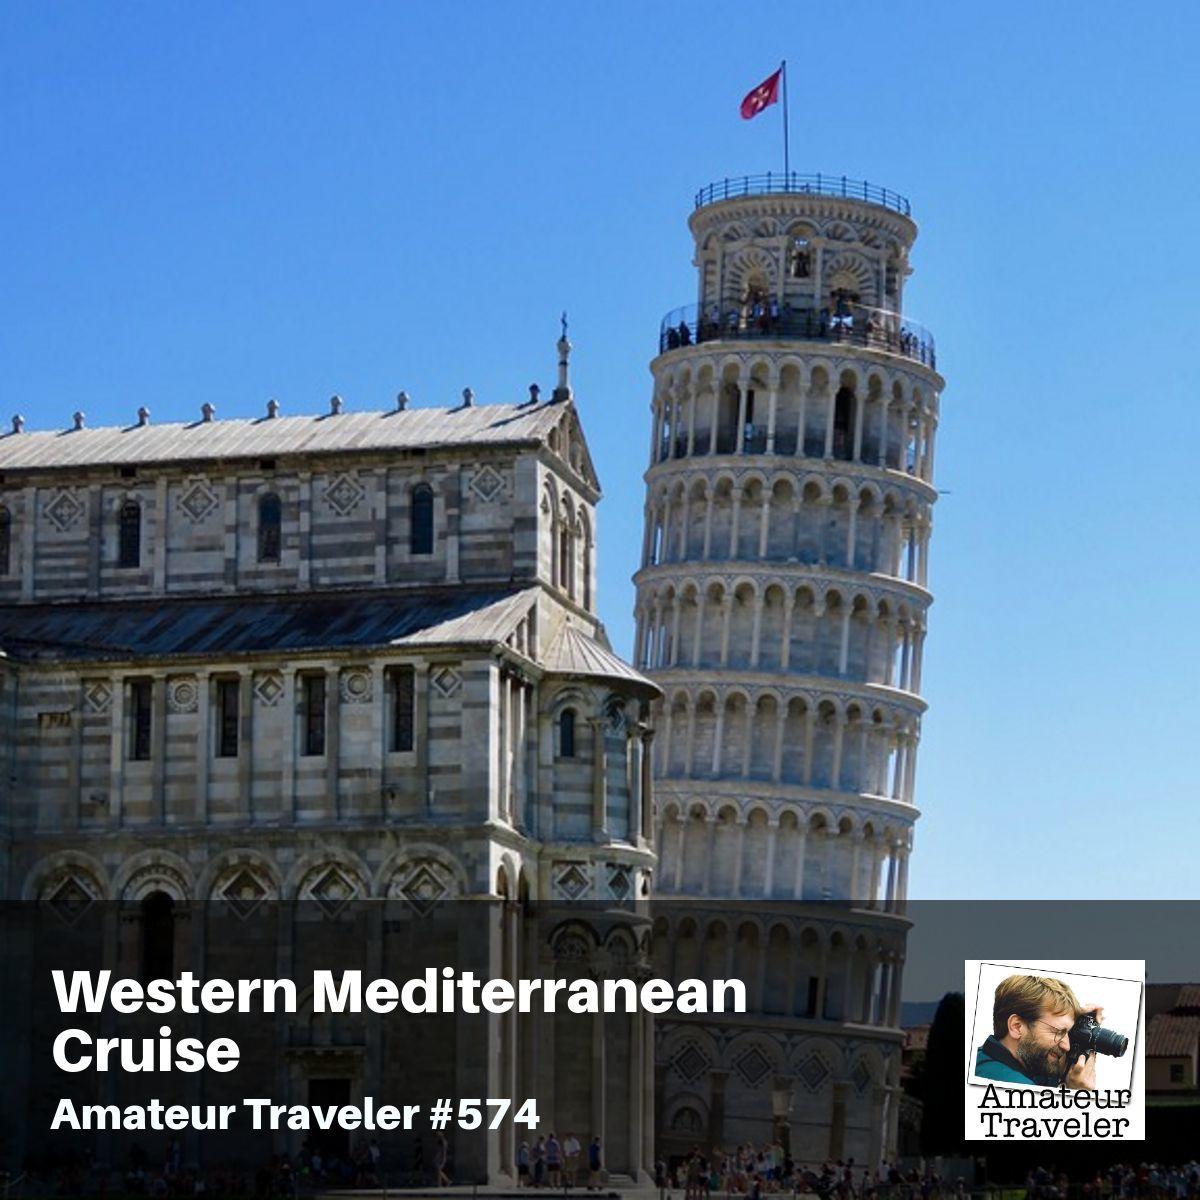 Cruise to the Western Mediterranean (Spain, Gibraltar, France, Monaco, Italy) on Holland America's Westerdam – Episode 574